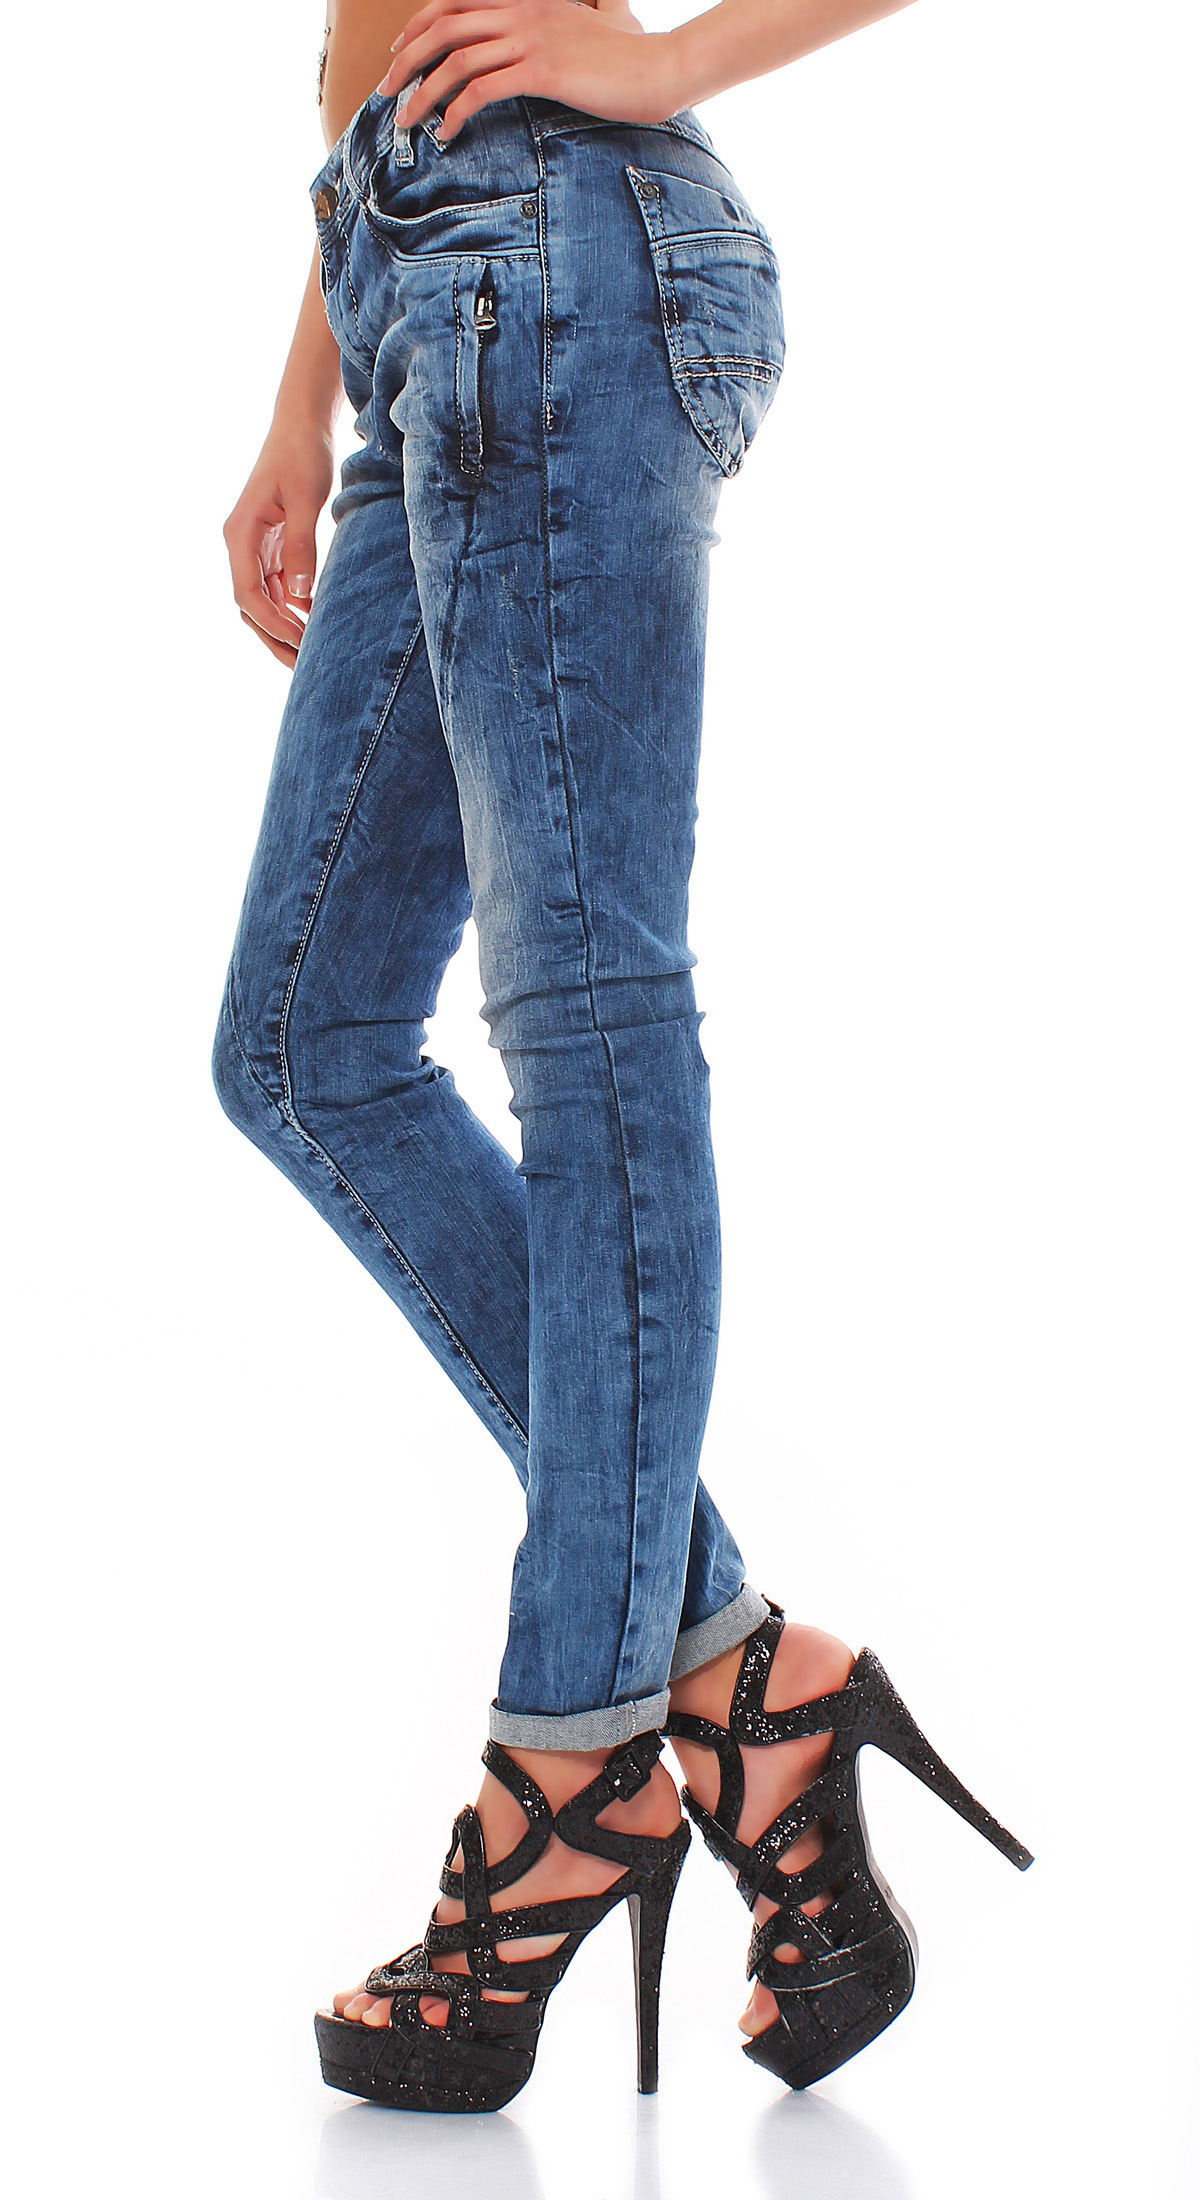 cipo baxx damen jeans cbw 0661 ebay. Black Bedroom Furniture Sets. Home Design Ideas